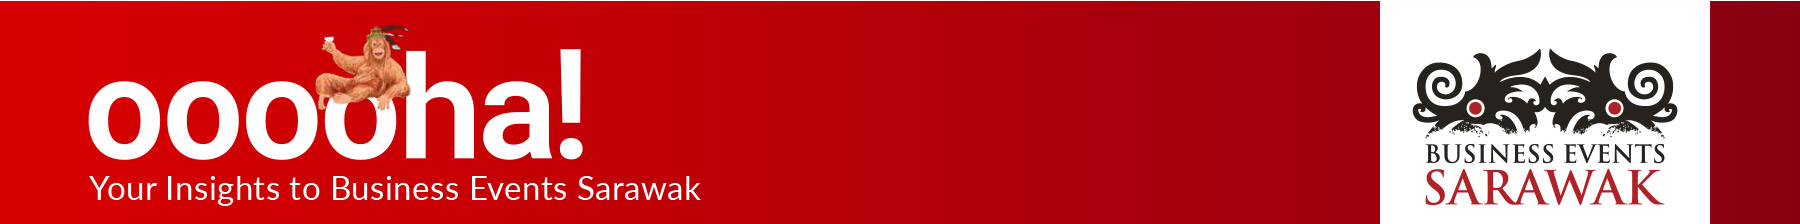 BESarawak Industry Related News – November 2020